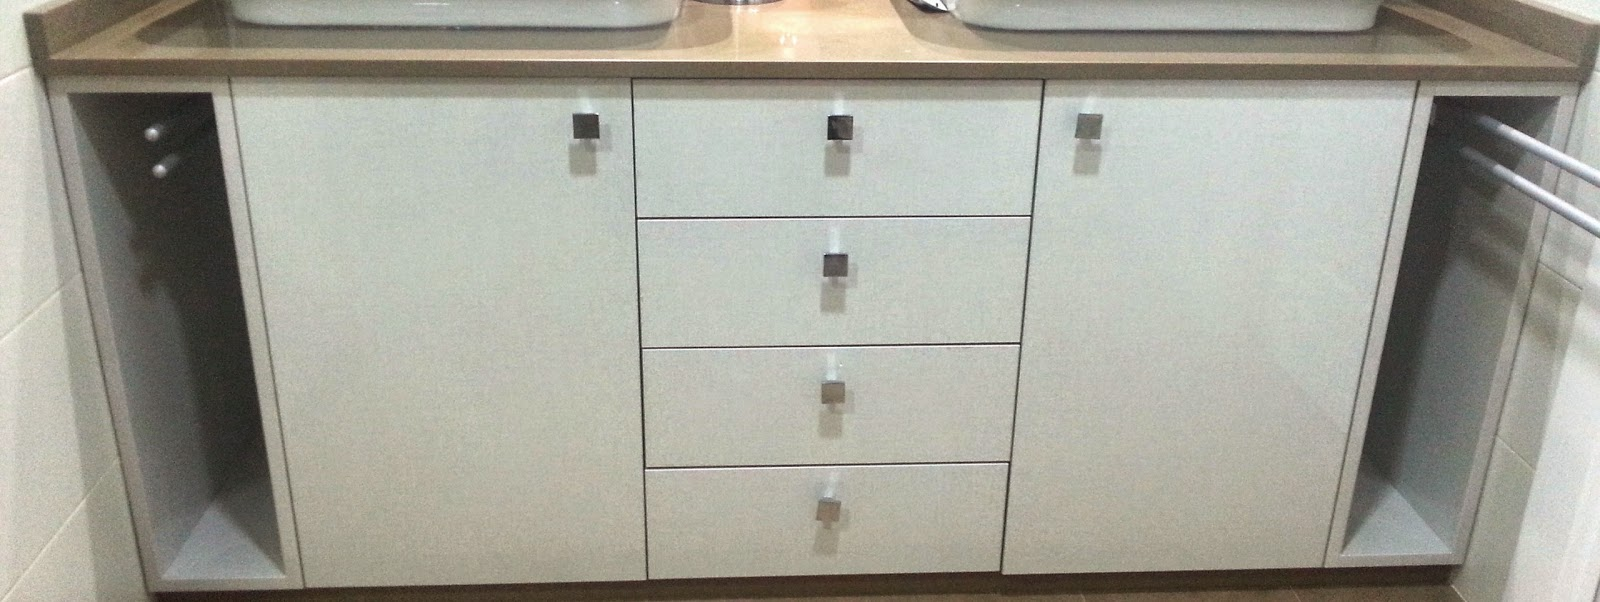 Carpinter a de dise o armarios a medida para lavabos for Armarios para lavabos